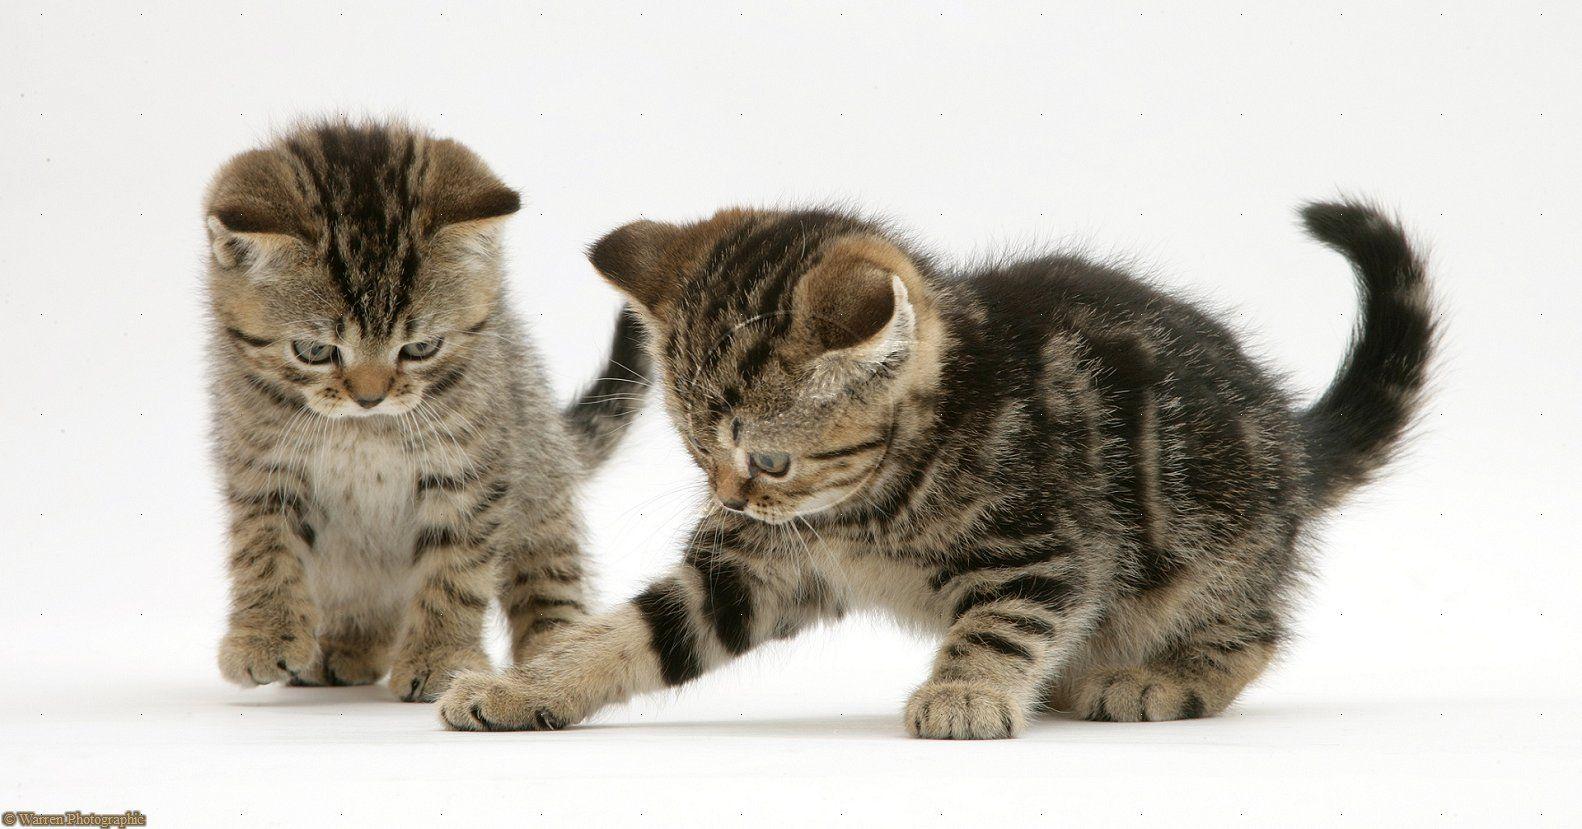 British Shorthair Brown Tabby Kittens Tabby Kitten British Shorthair Cats Tabby Cat